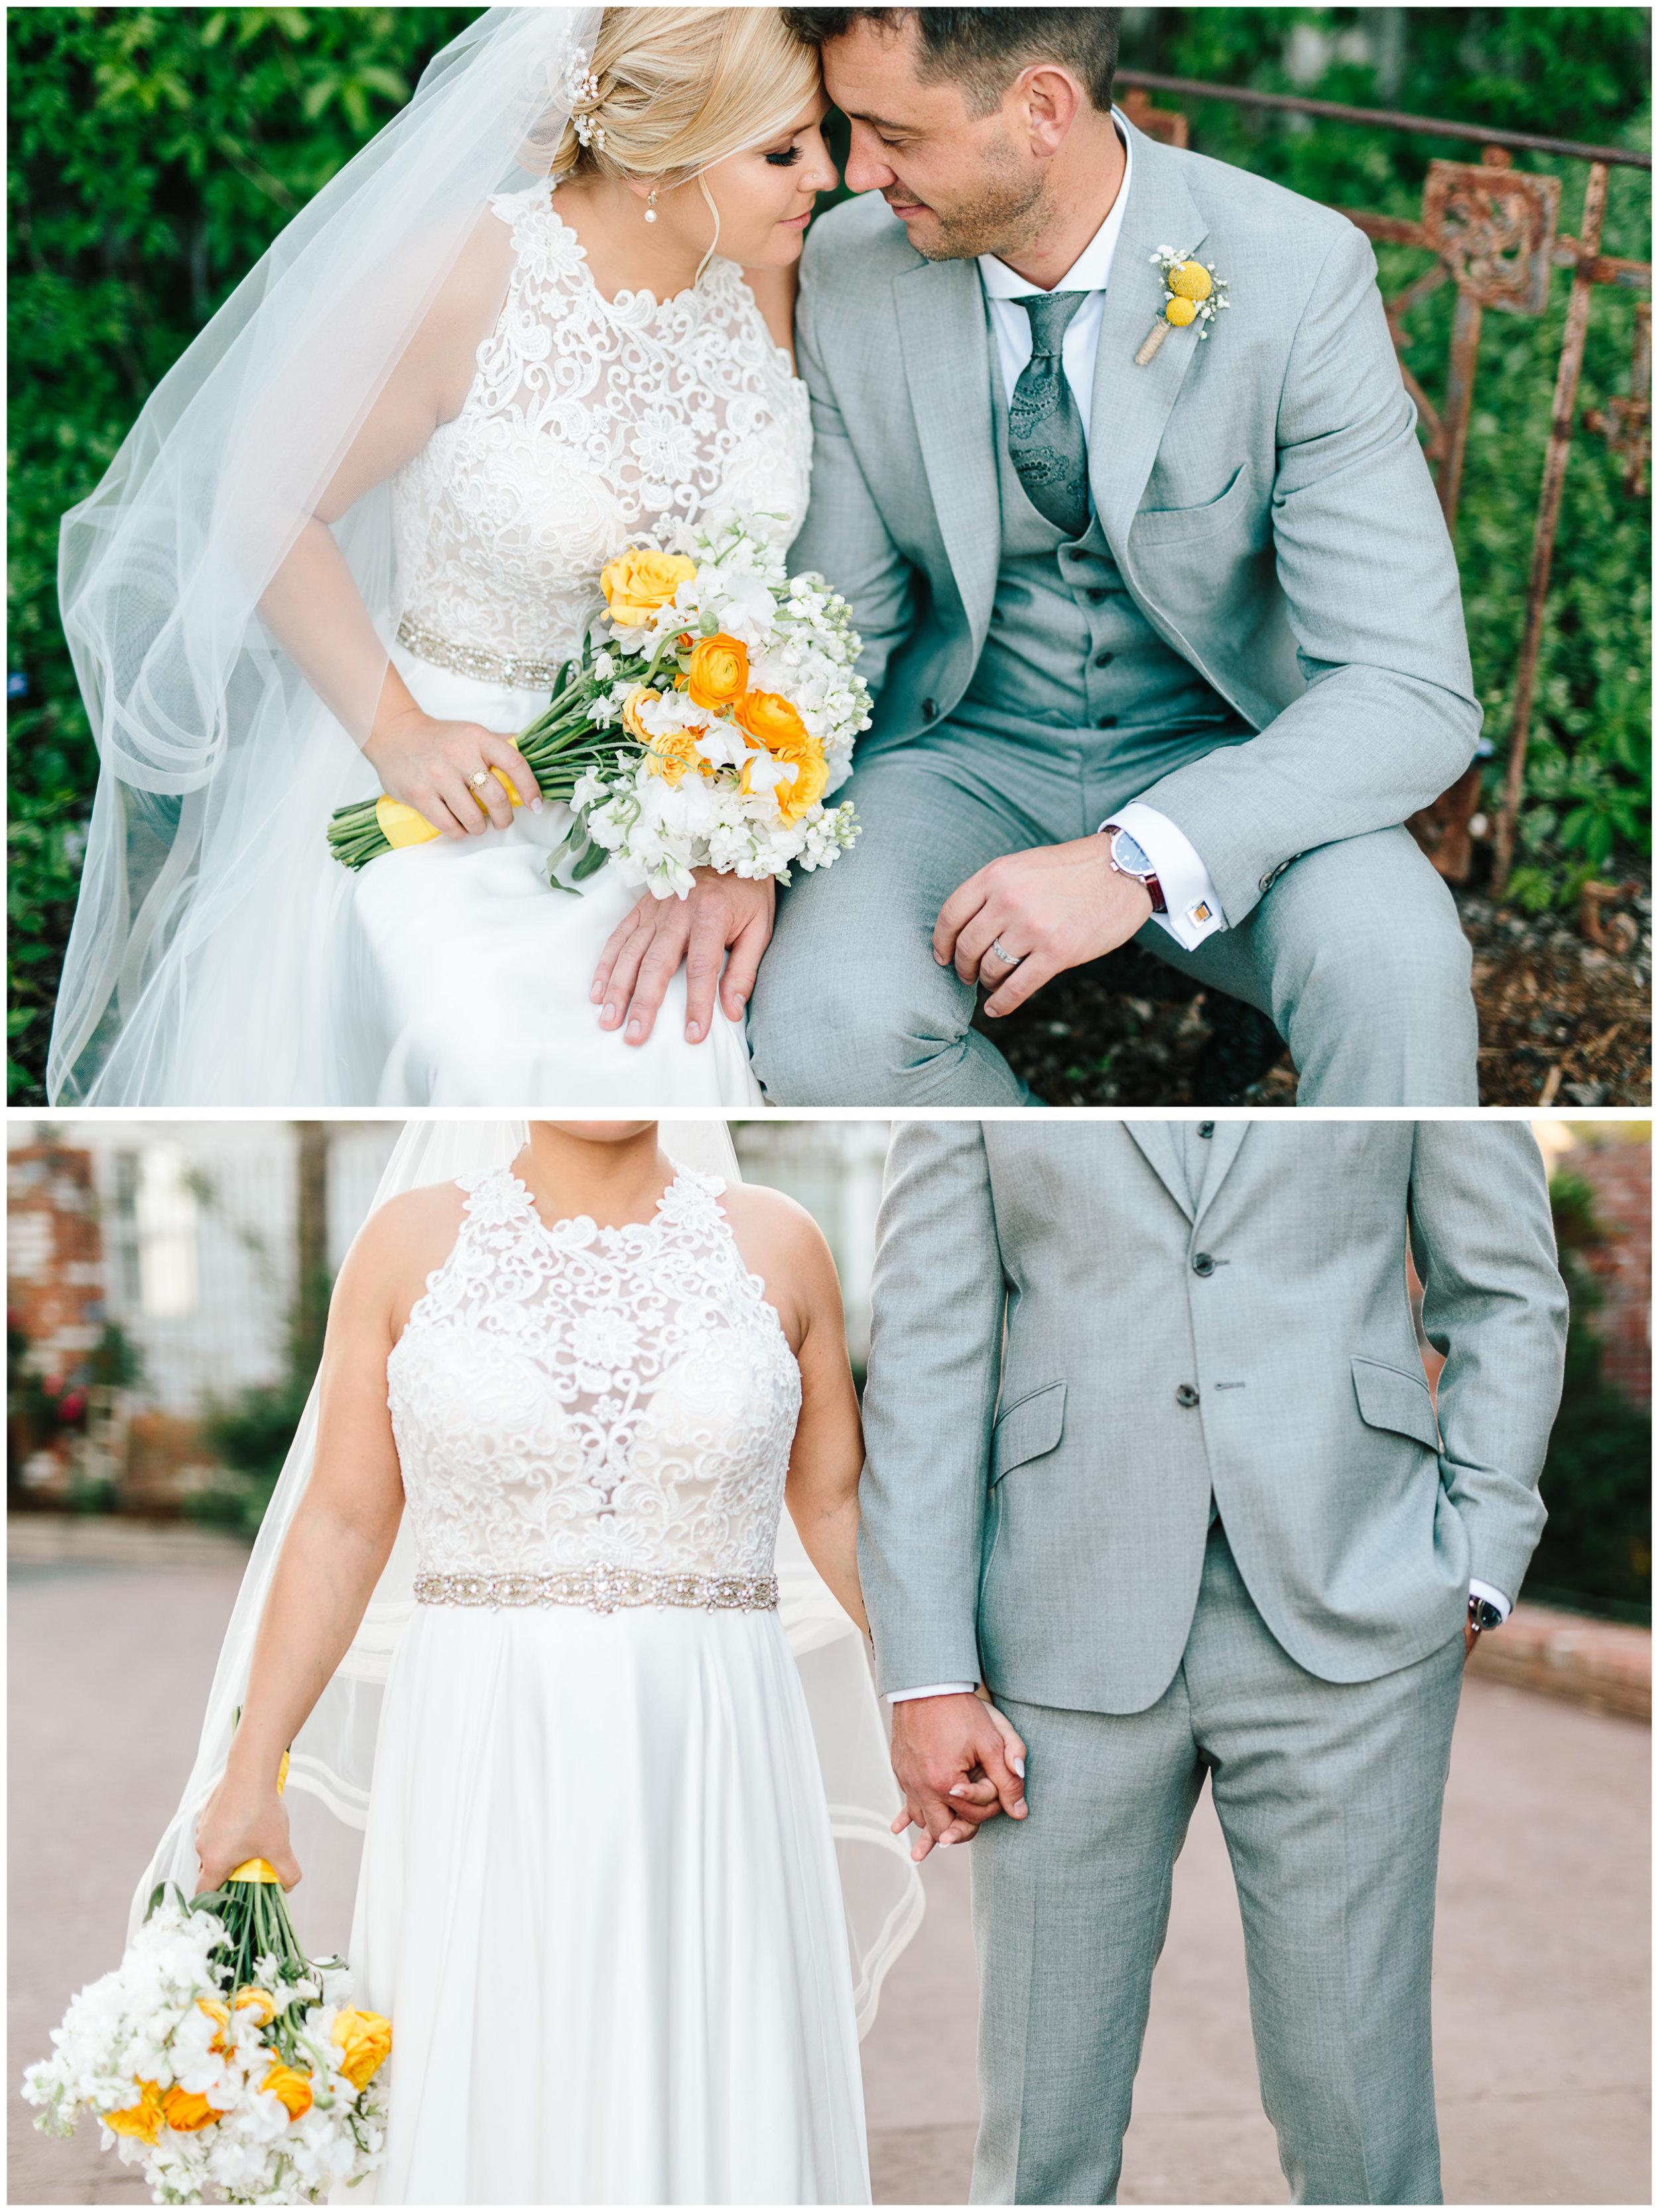 Lafayette_Colorado_Wedding_44.jpg